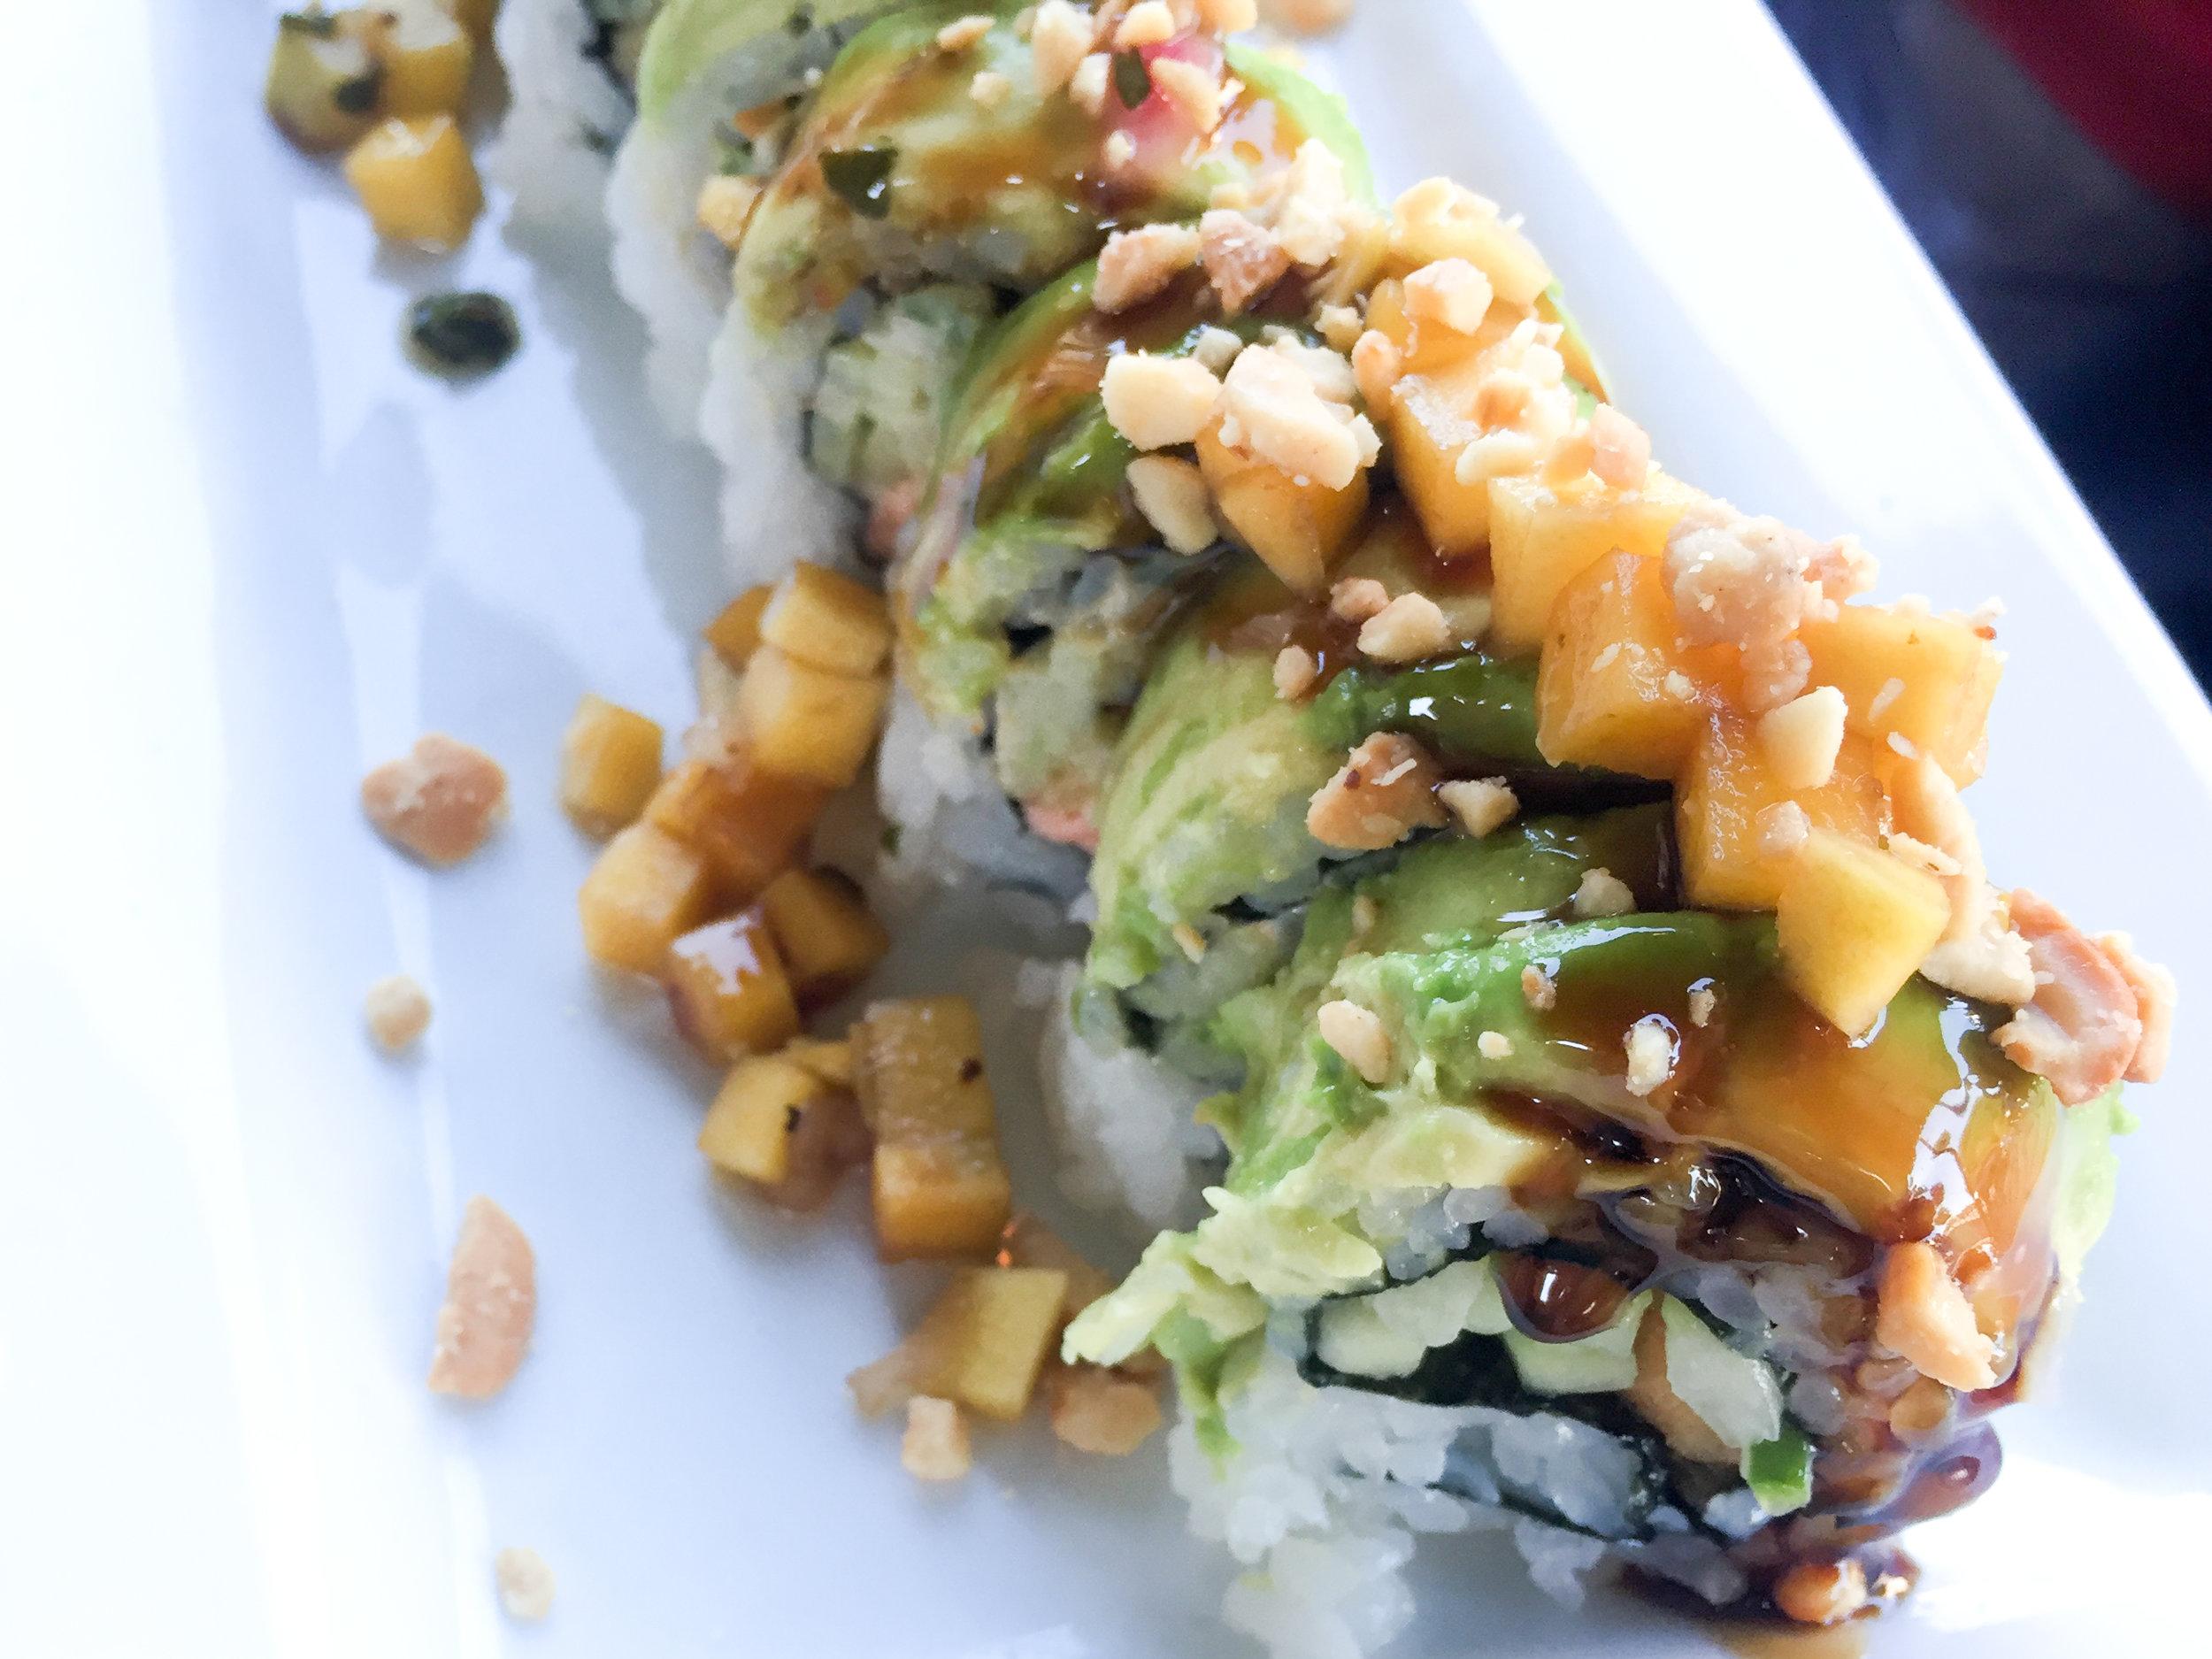 eez-fusion-sushi-huntersville-nc-cash-money-roll